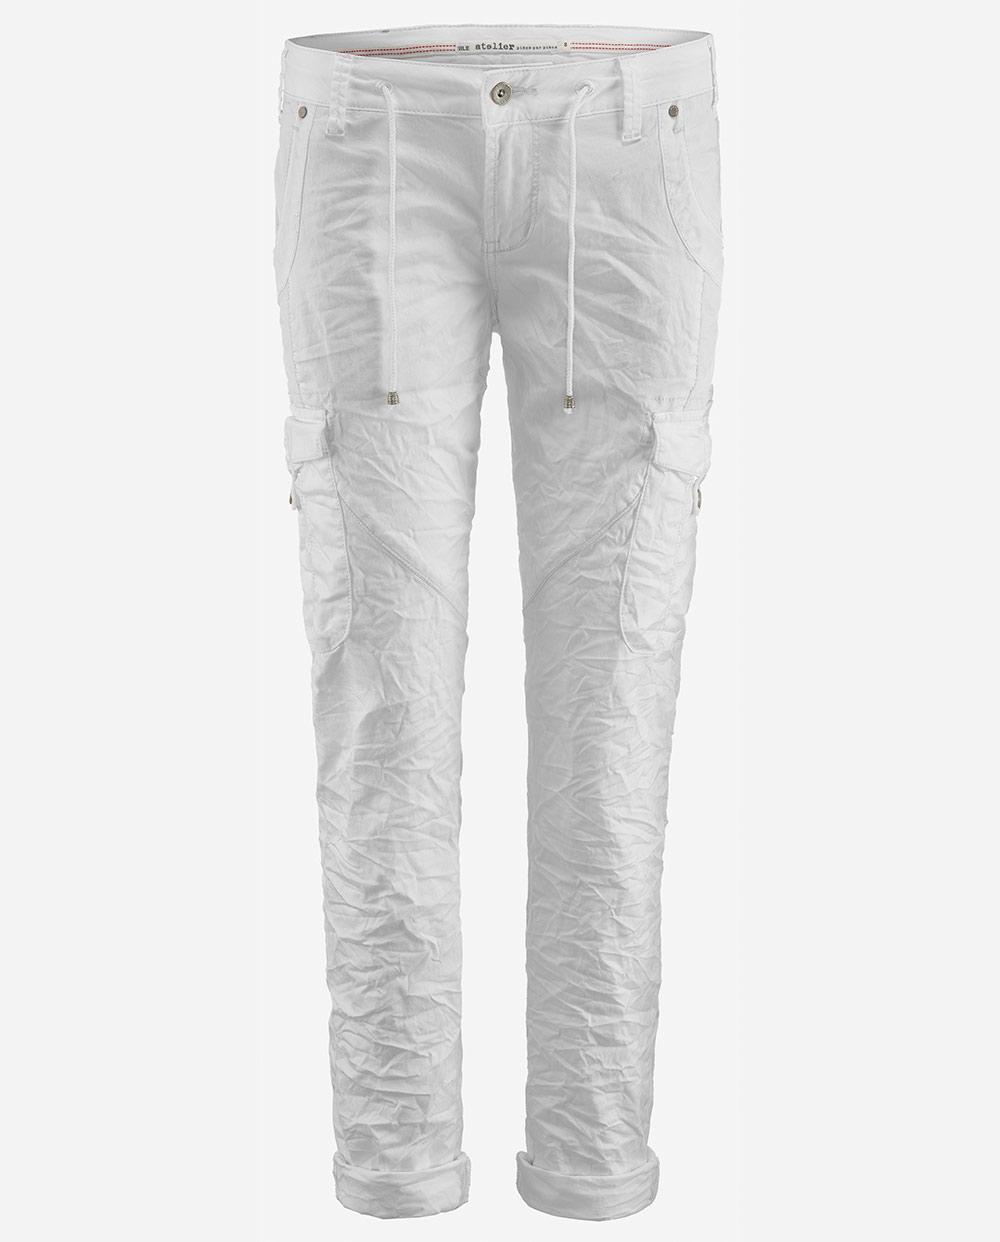 Nile f14144 front white